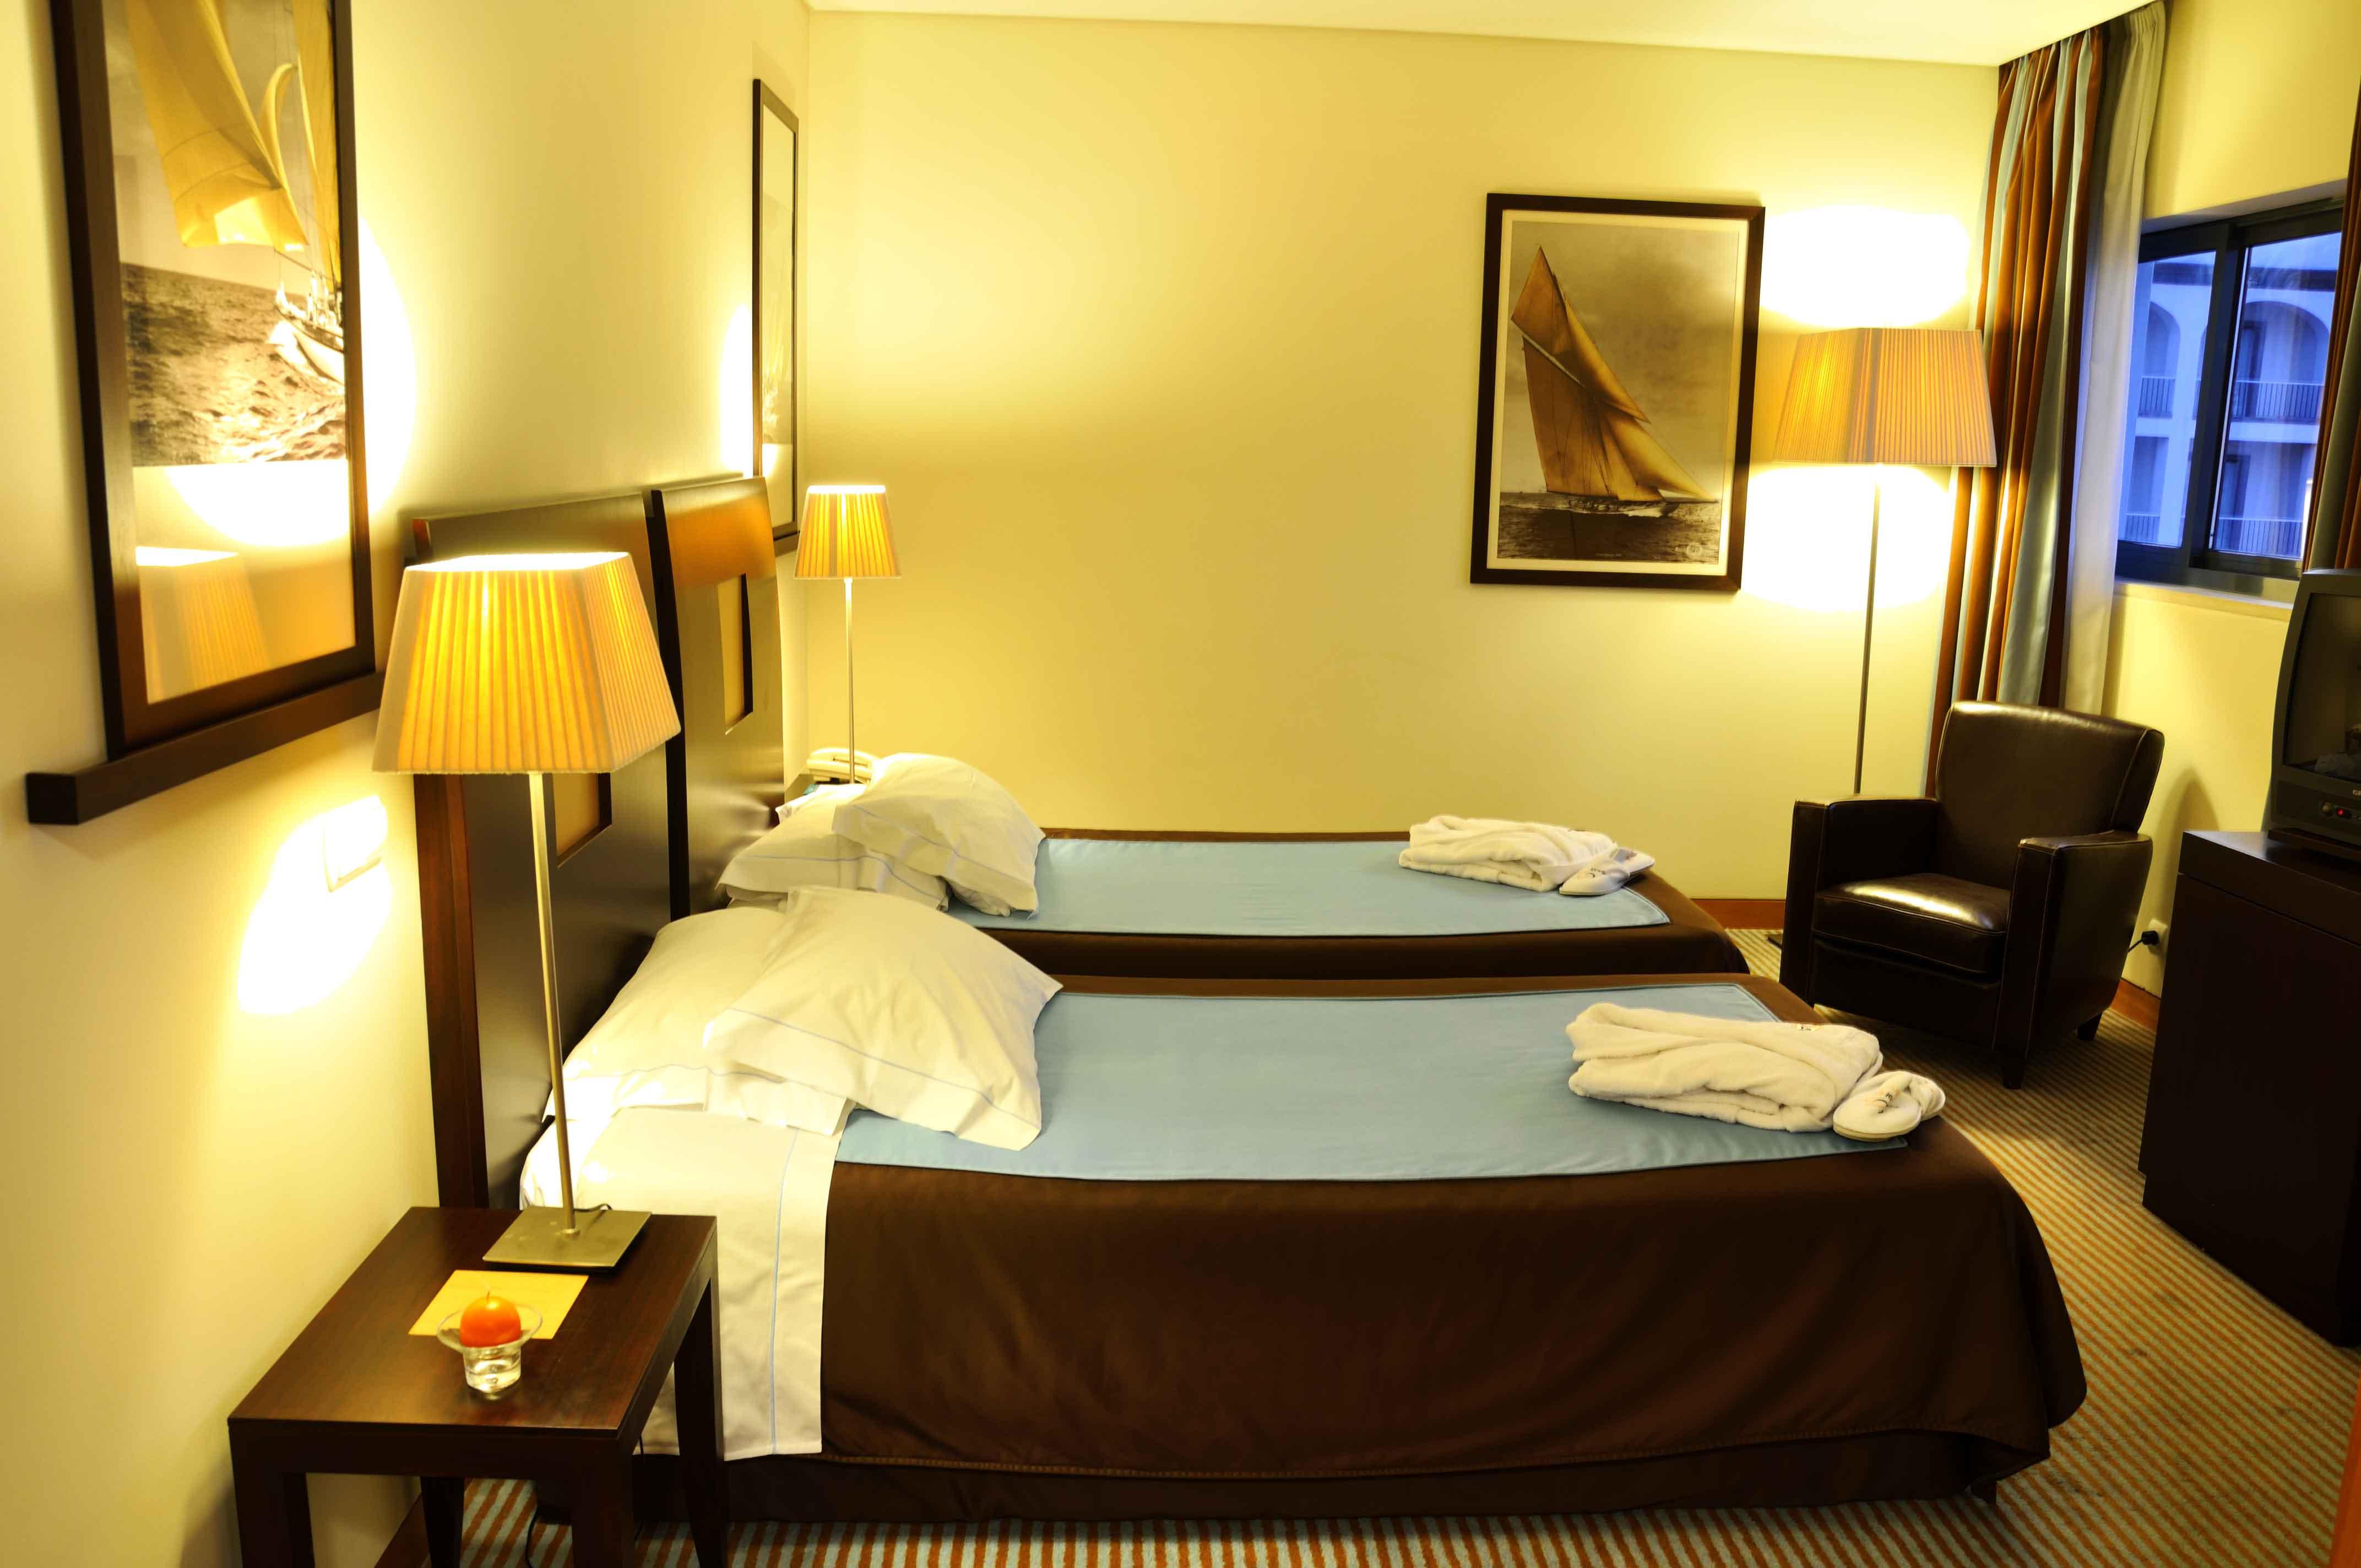 Hotel Marina Atlantico_Zimmerbeispiel 2